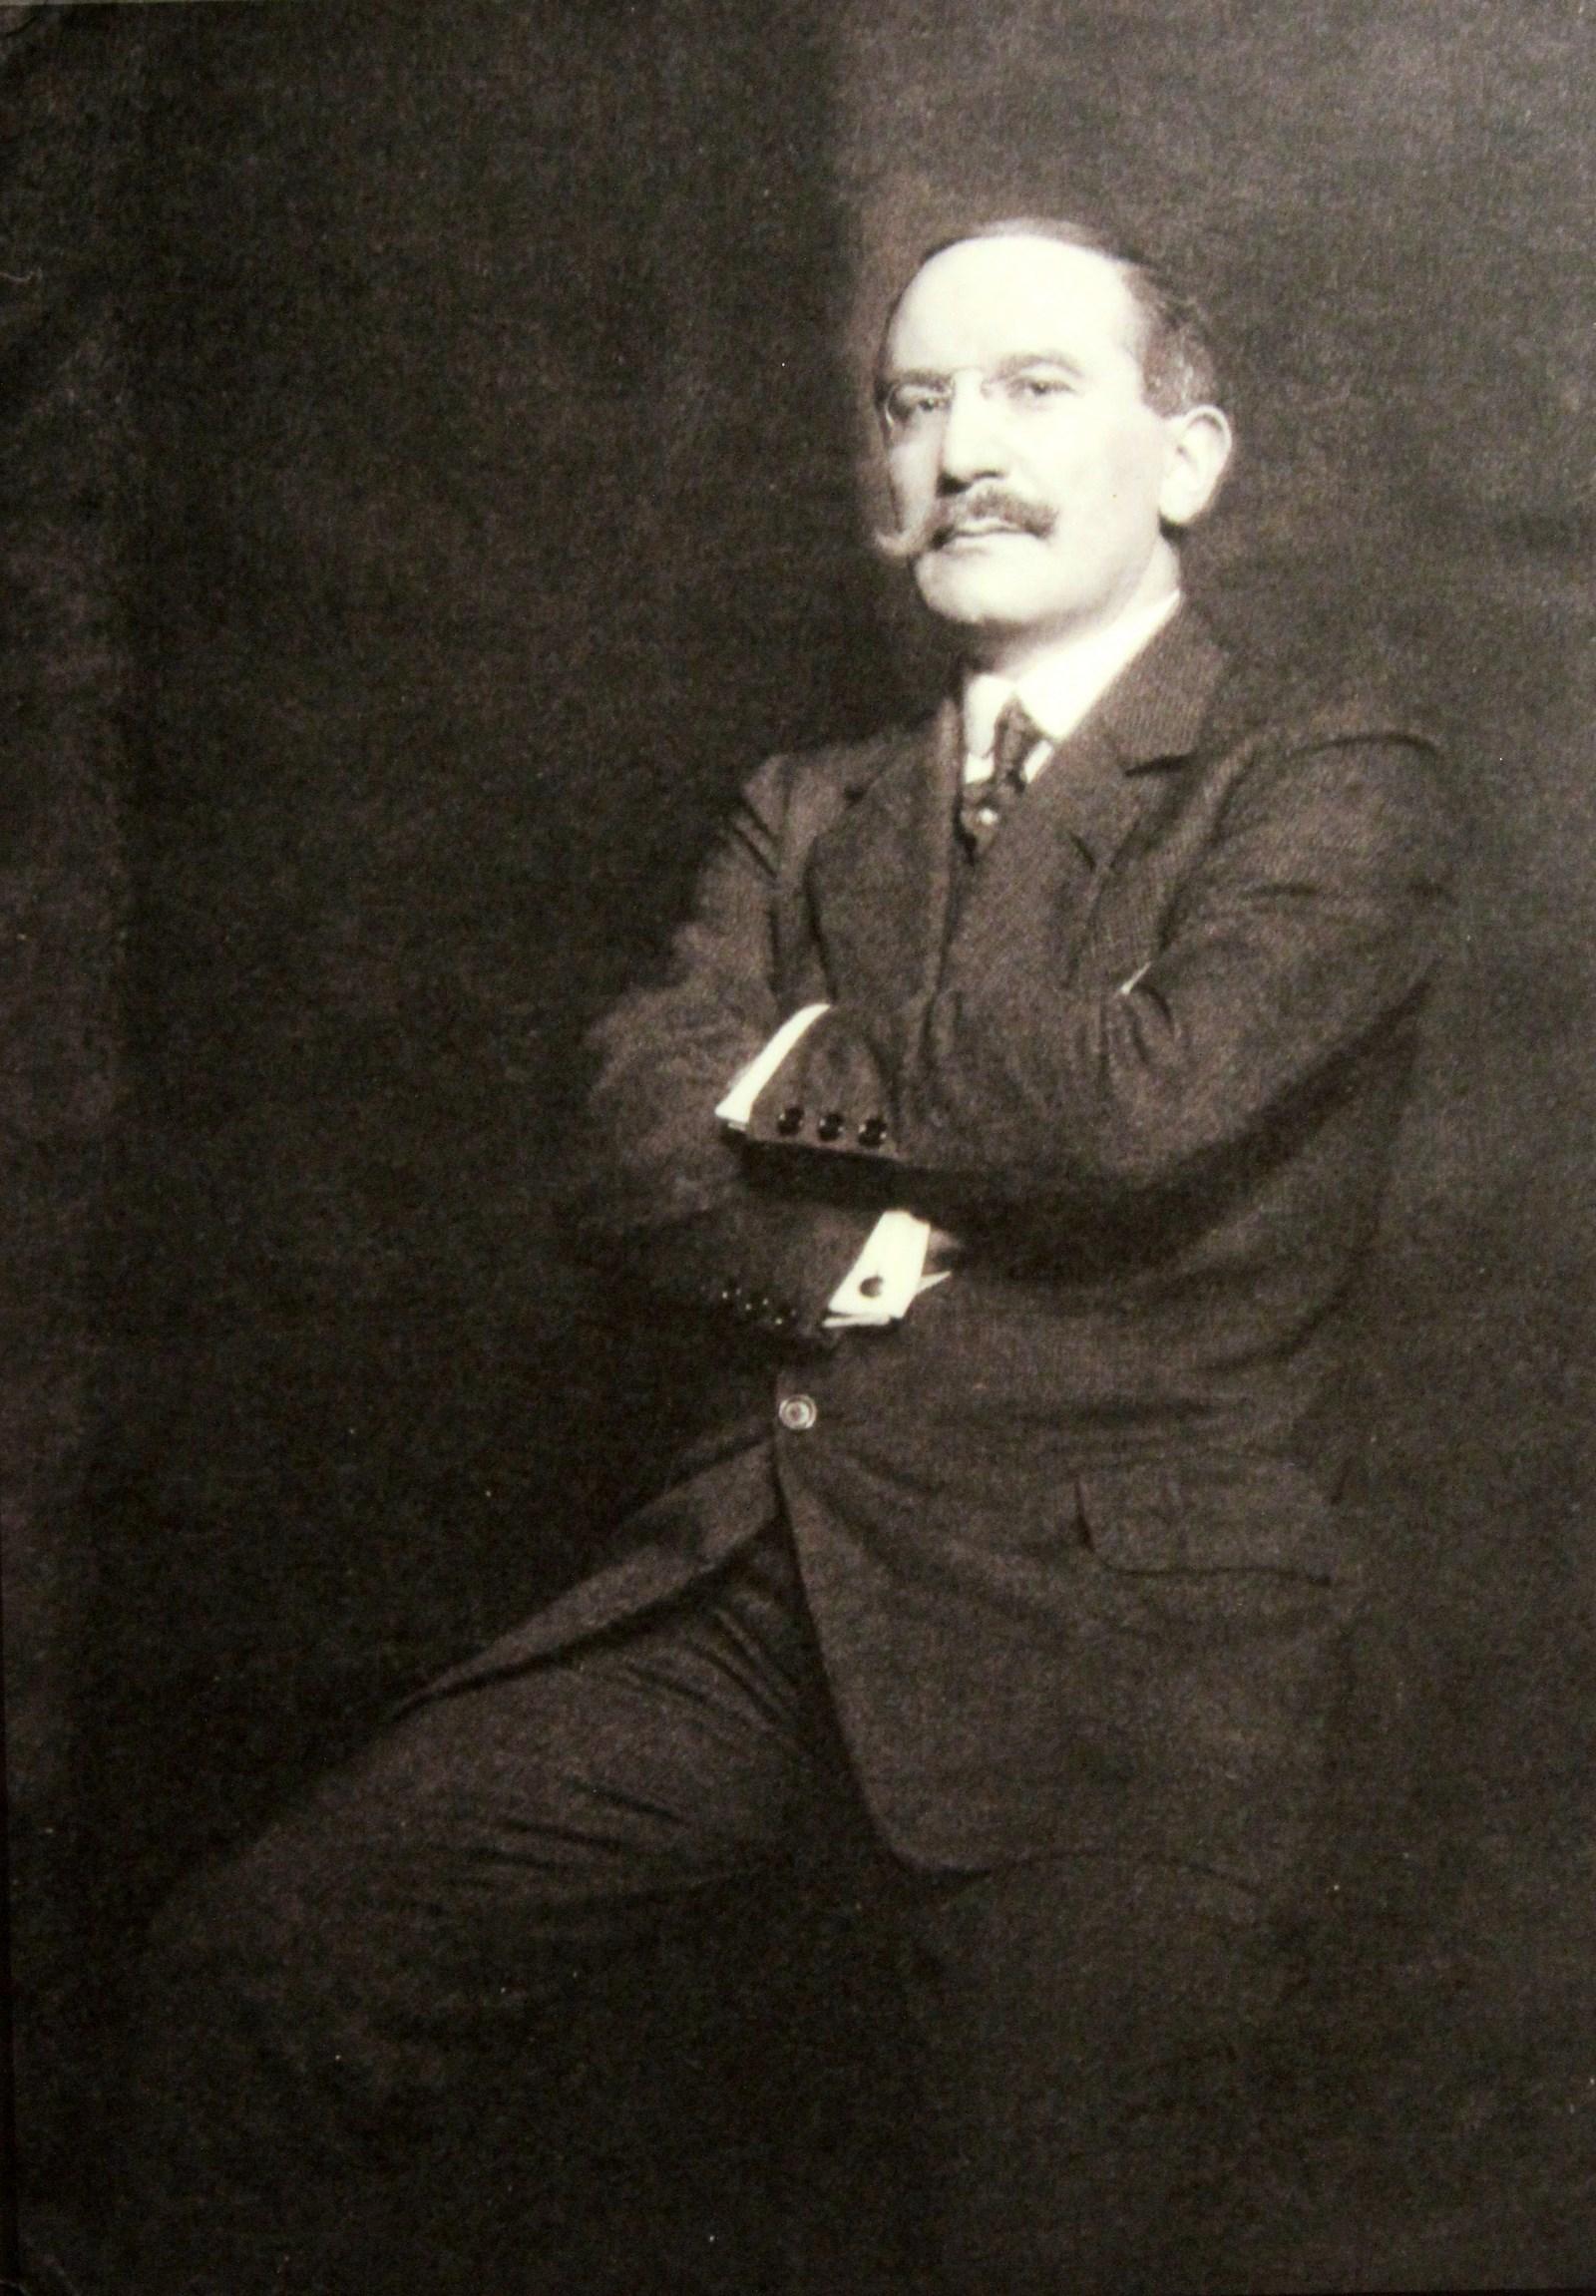 Лев Бакст. Фотография конца 1910-х». 02.04.2016